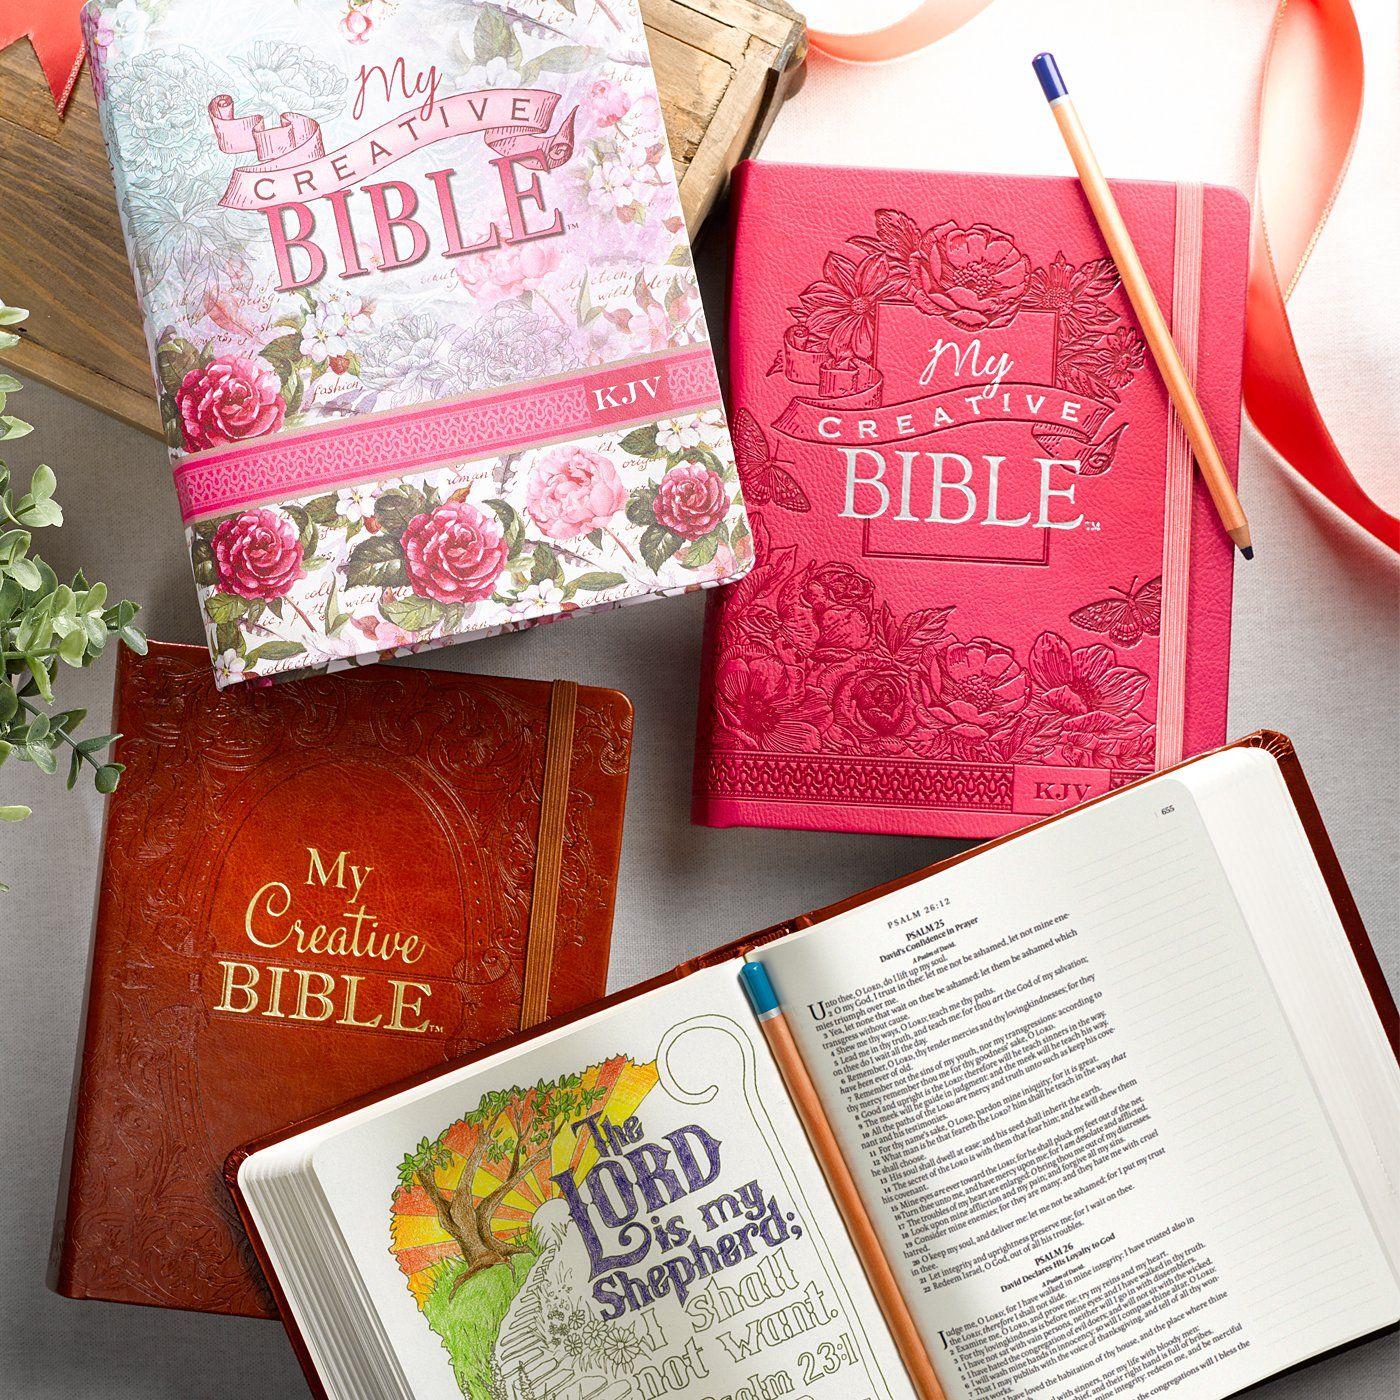 My Creative Bible KJV: Tan Hardcover Bible for Creative Journaling: Christian Art Gifts' Brad Miedema & Allison Sowers: 9781432115340: Amazon.com: Books